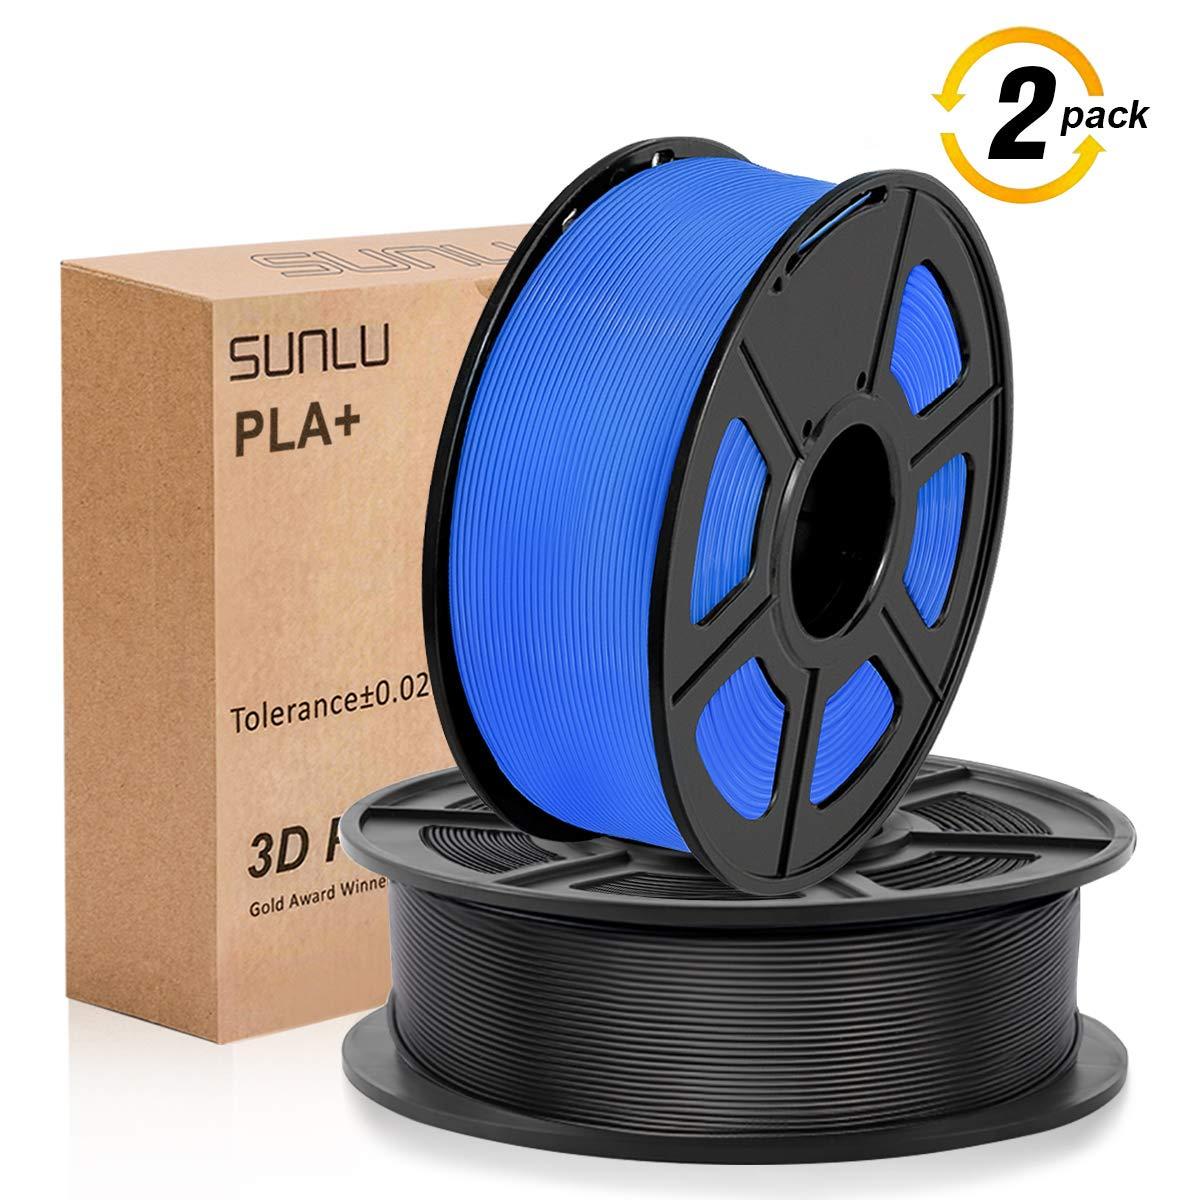 Skin SUNLU 3D filament 1.75 Coffee PLA+ Filament 1.75mm Orange 3KG PLA+ Filament 0.02mm for 3D Printer 3D Pens